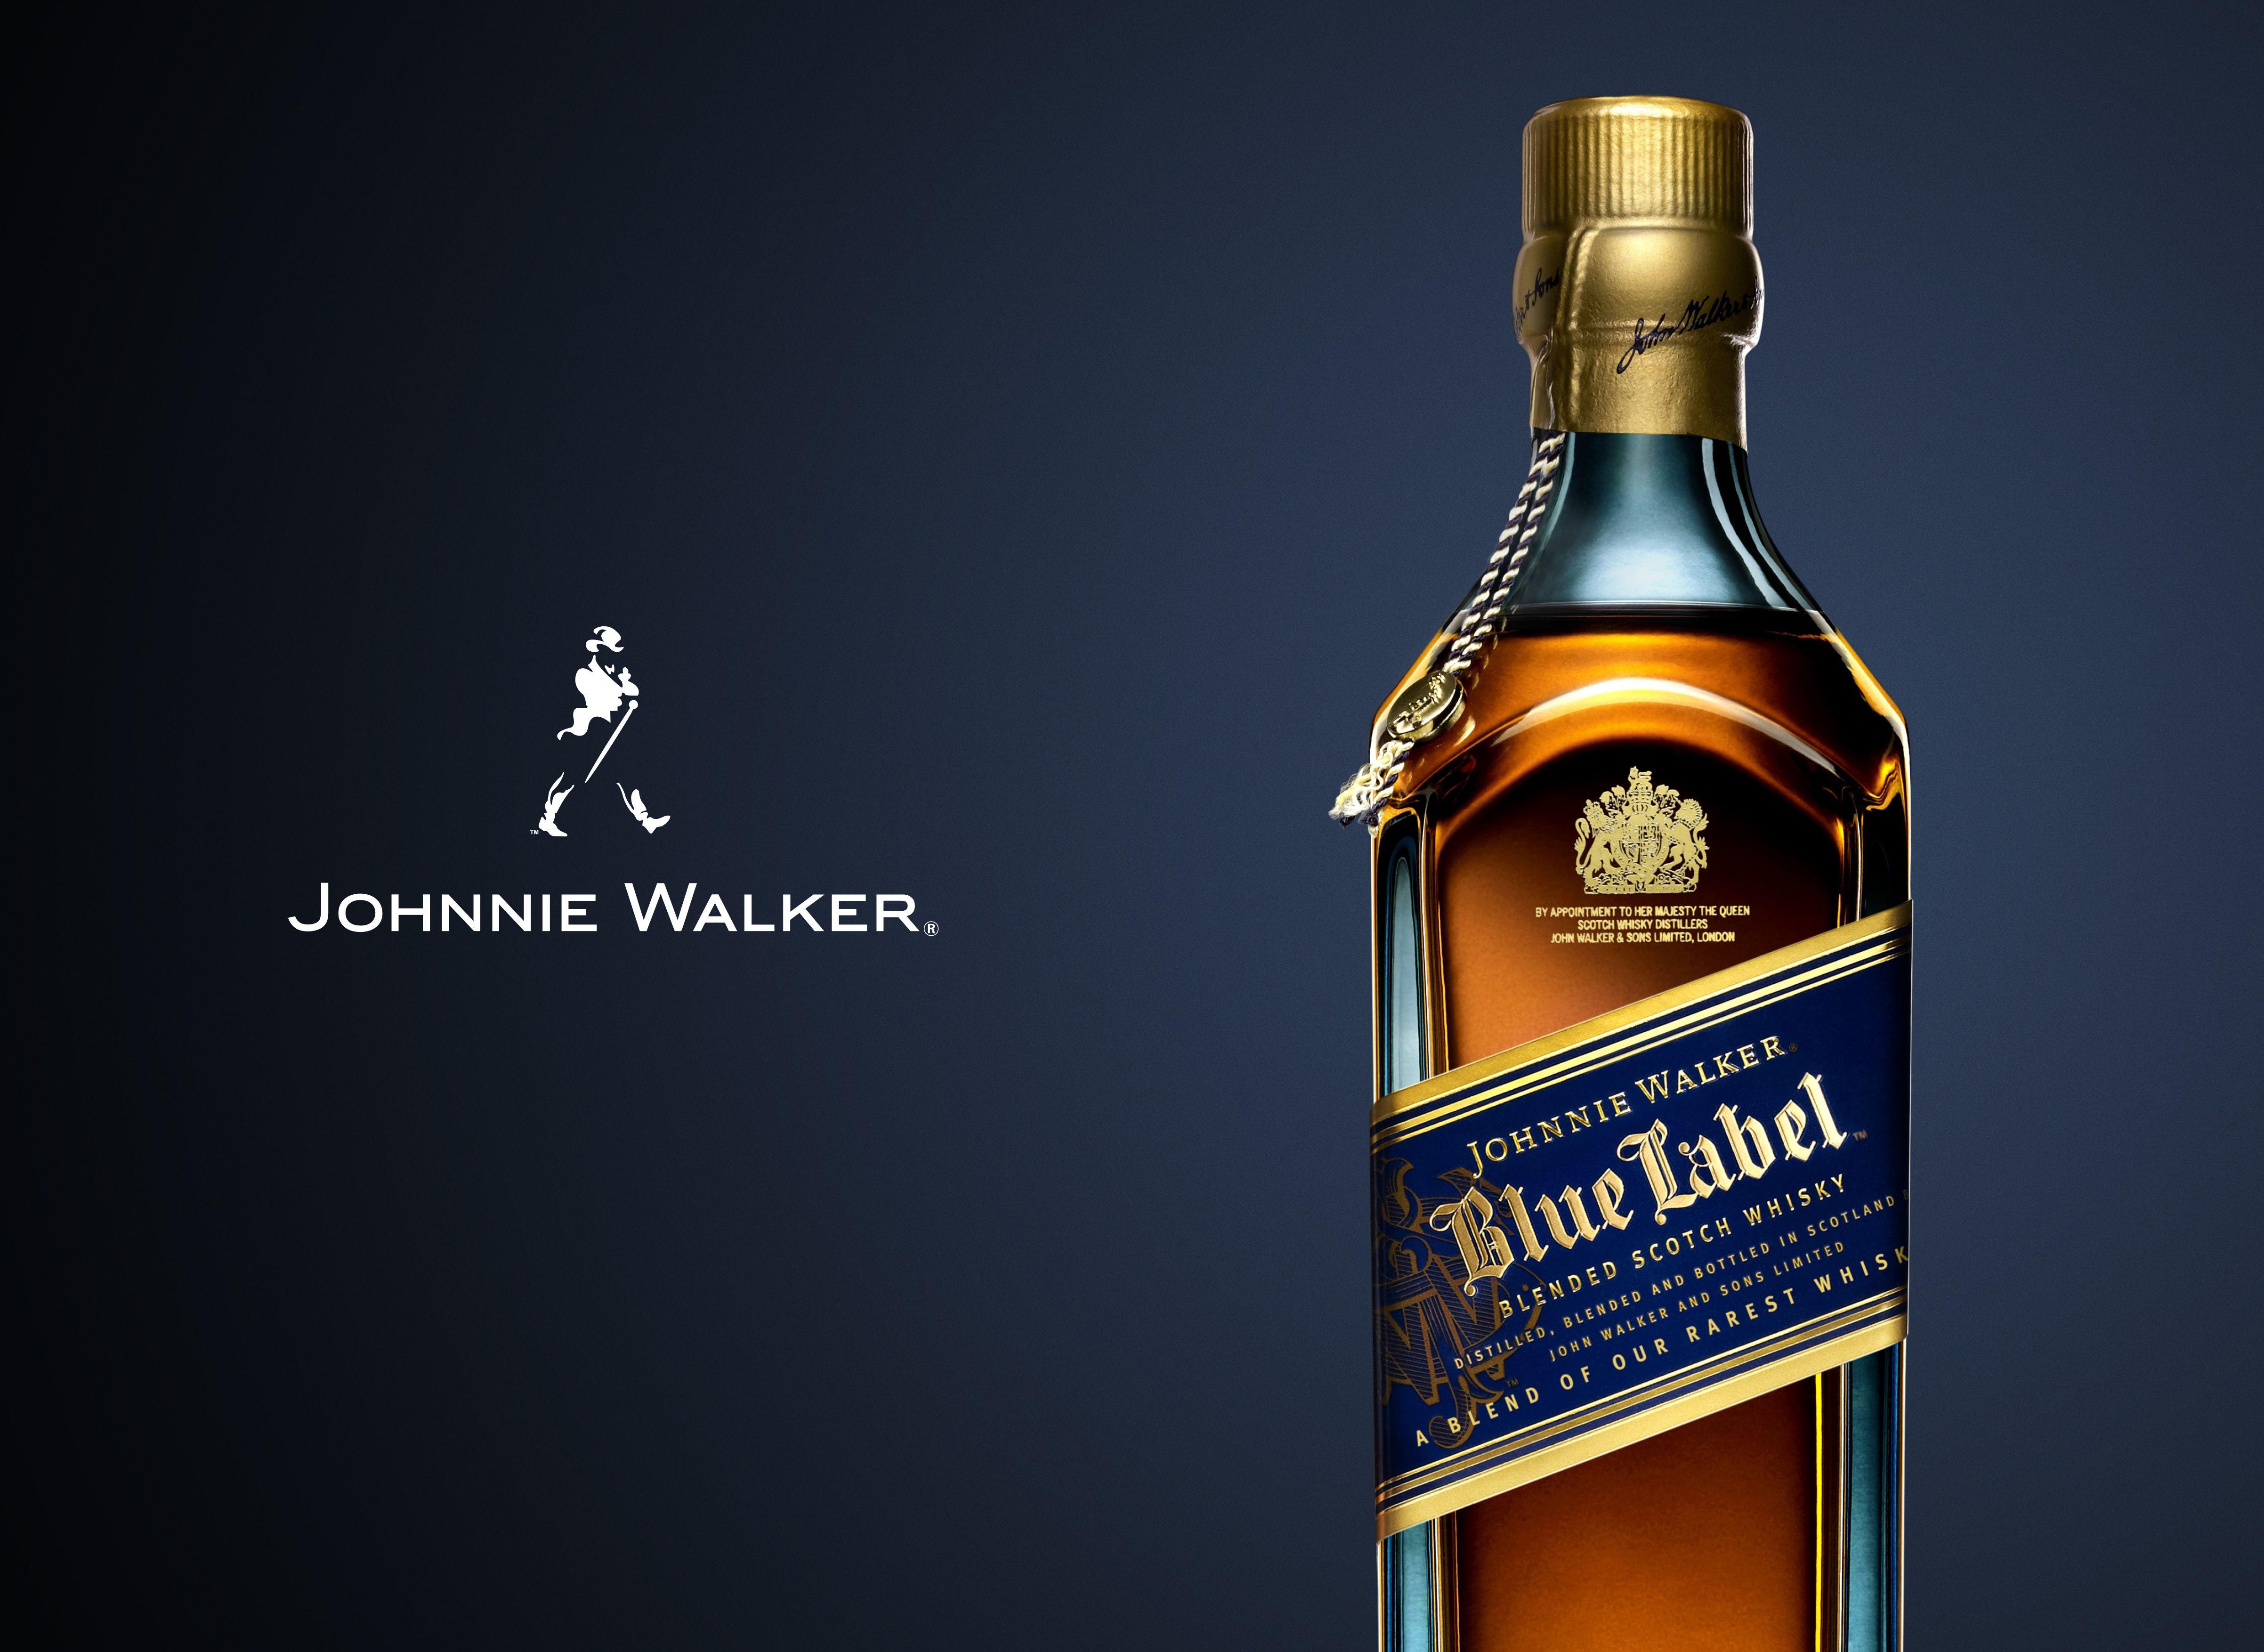 johnnie walker blue whiskies cotton club bilbao pinterest whisky. Black Bedroom Furniture Sets. Home Design Ideas